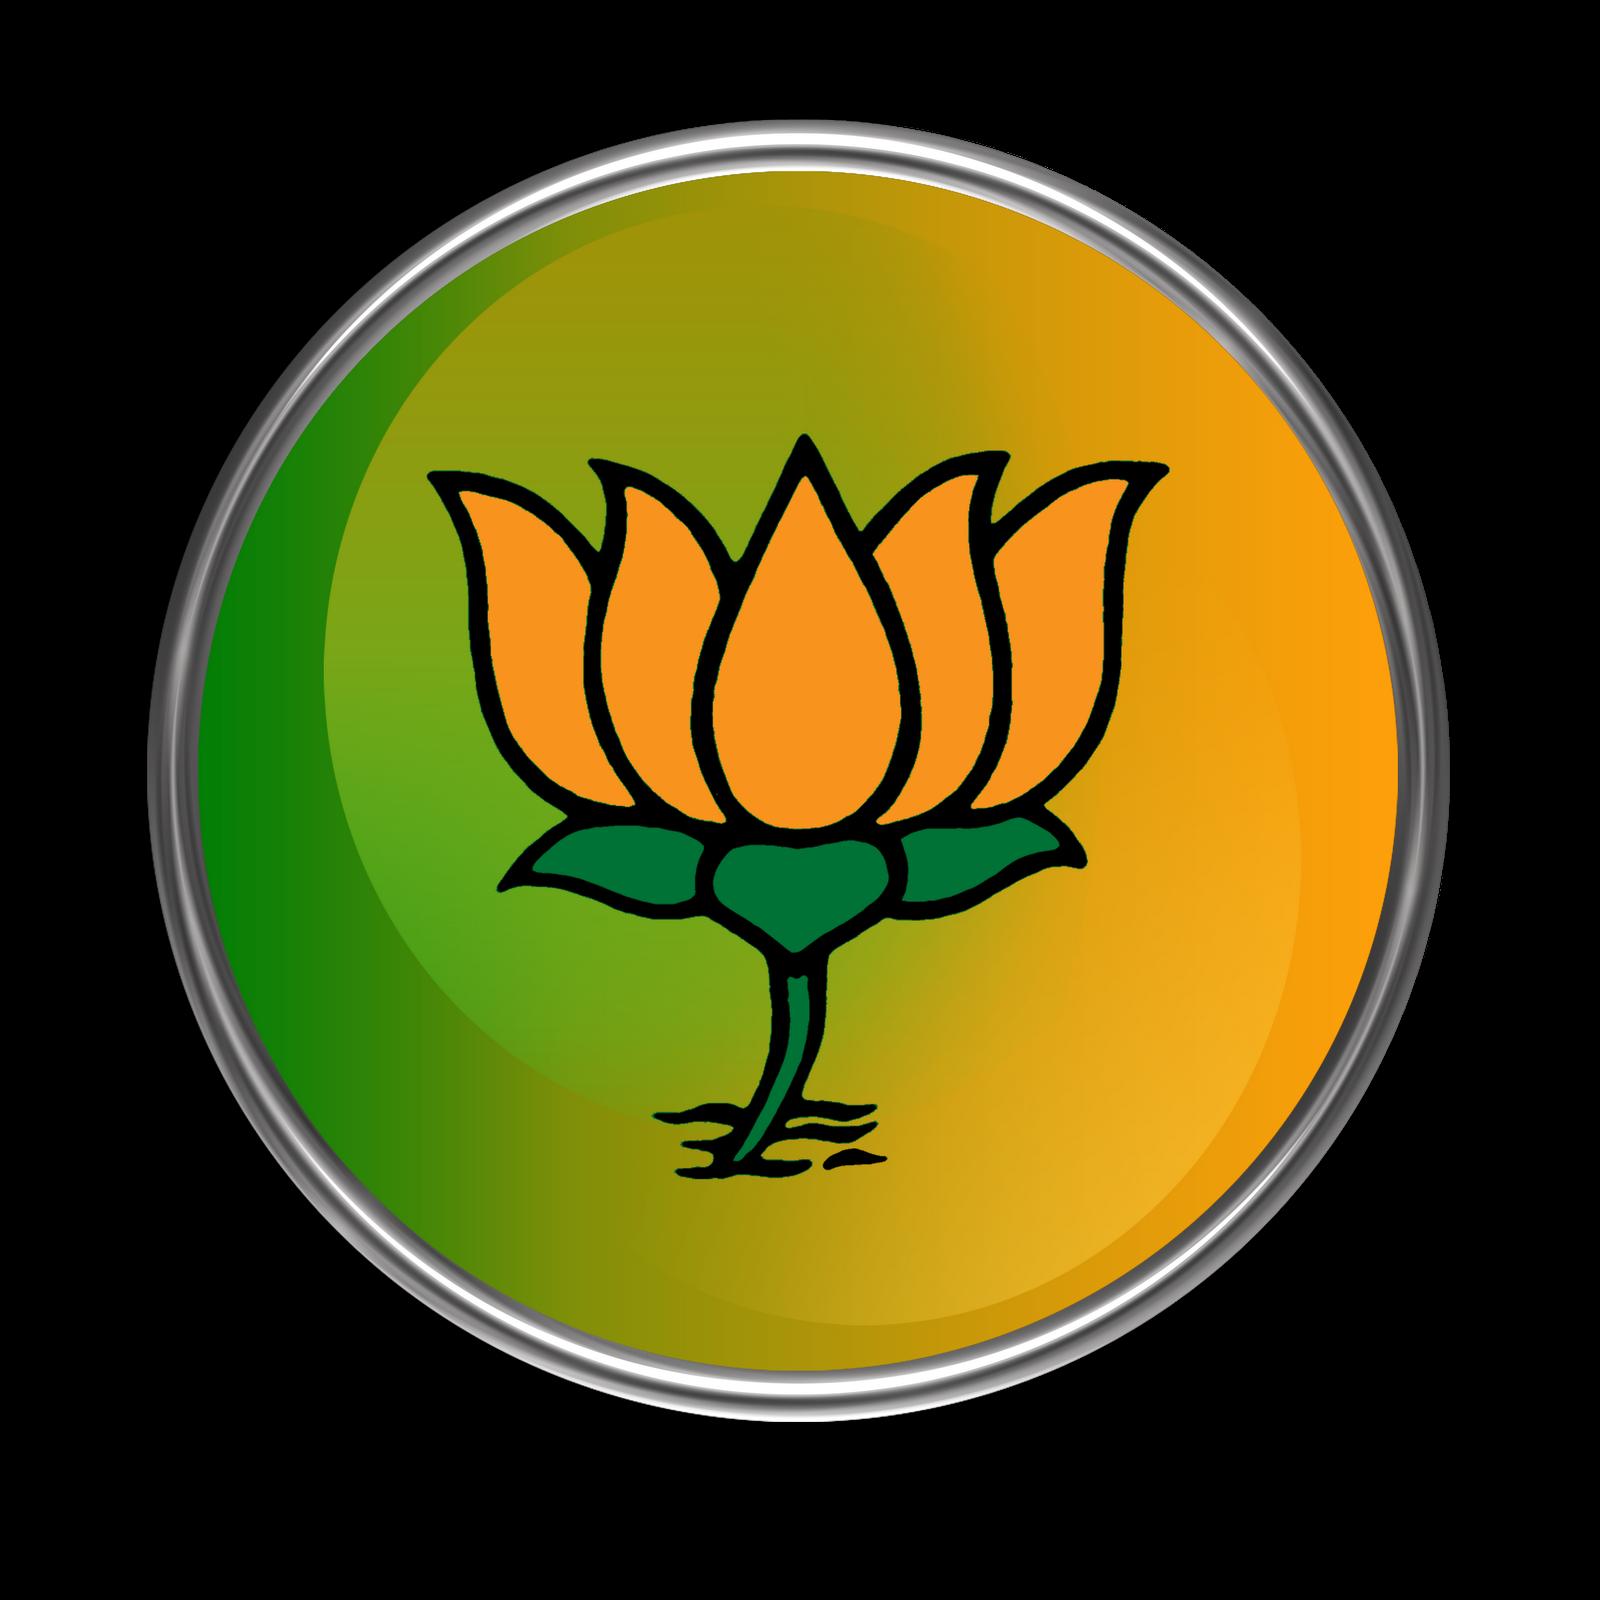 http://1.bp.blogspot.com/-jEVtMERp21o/Tu9HkAK_ZEI/AAAAAAAADzI/T8Yg-4ky3EU/s1600/bharatiya%2Bjanata%2Bparty%2Blogo.png